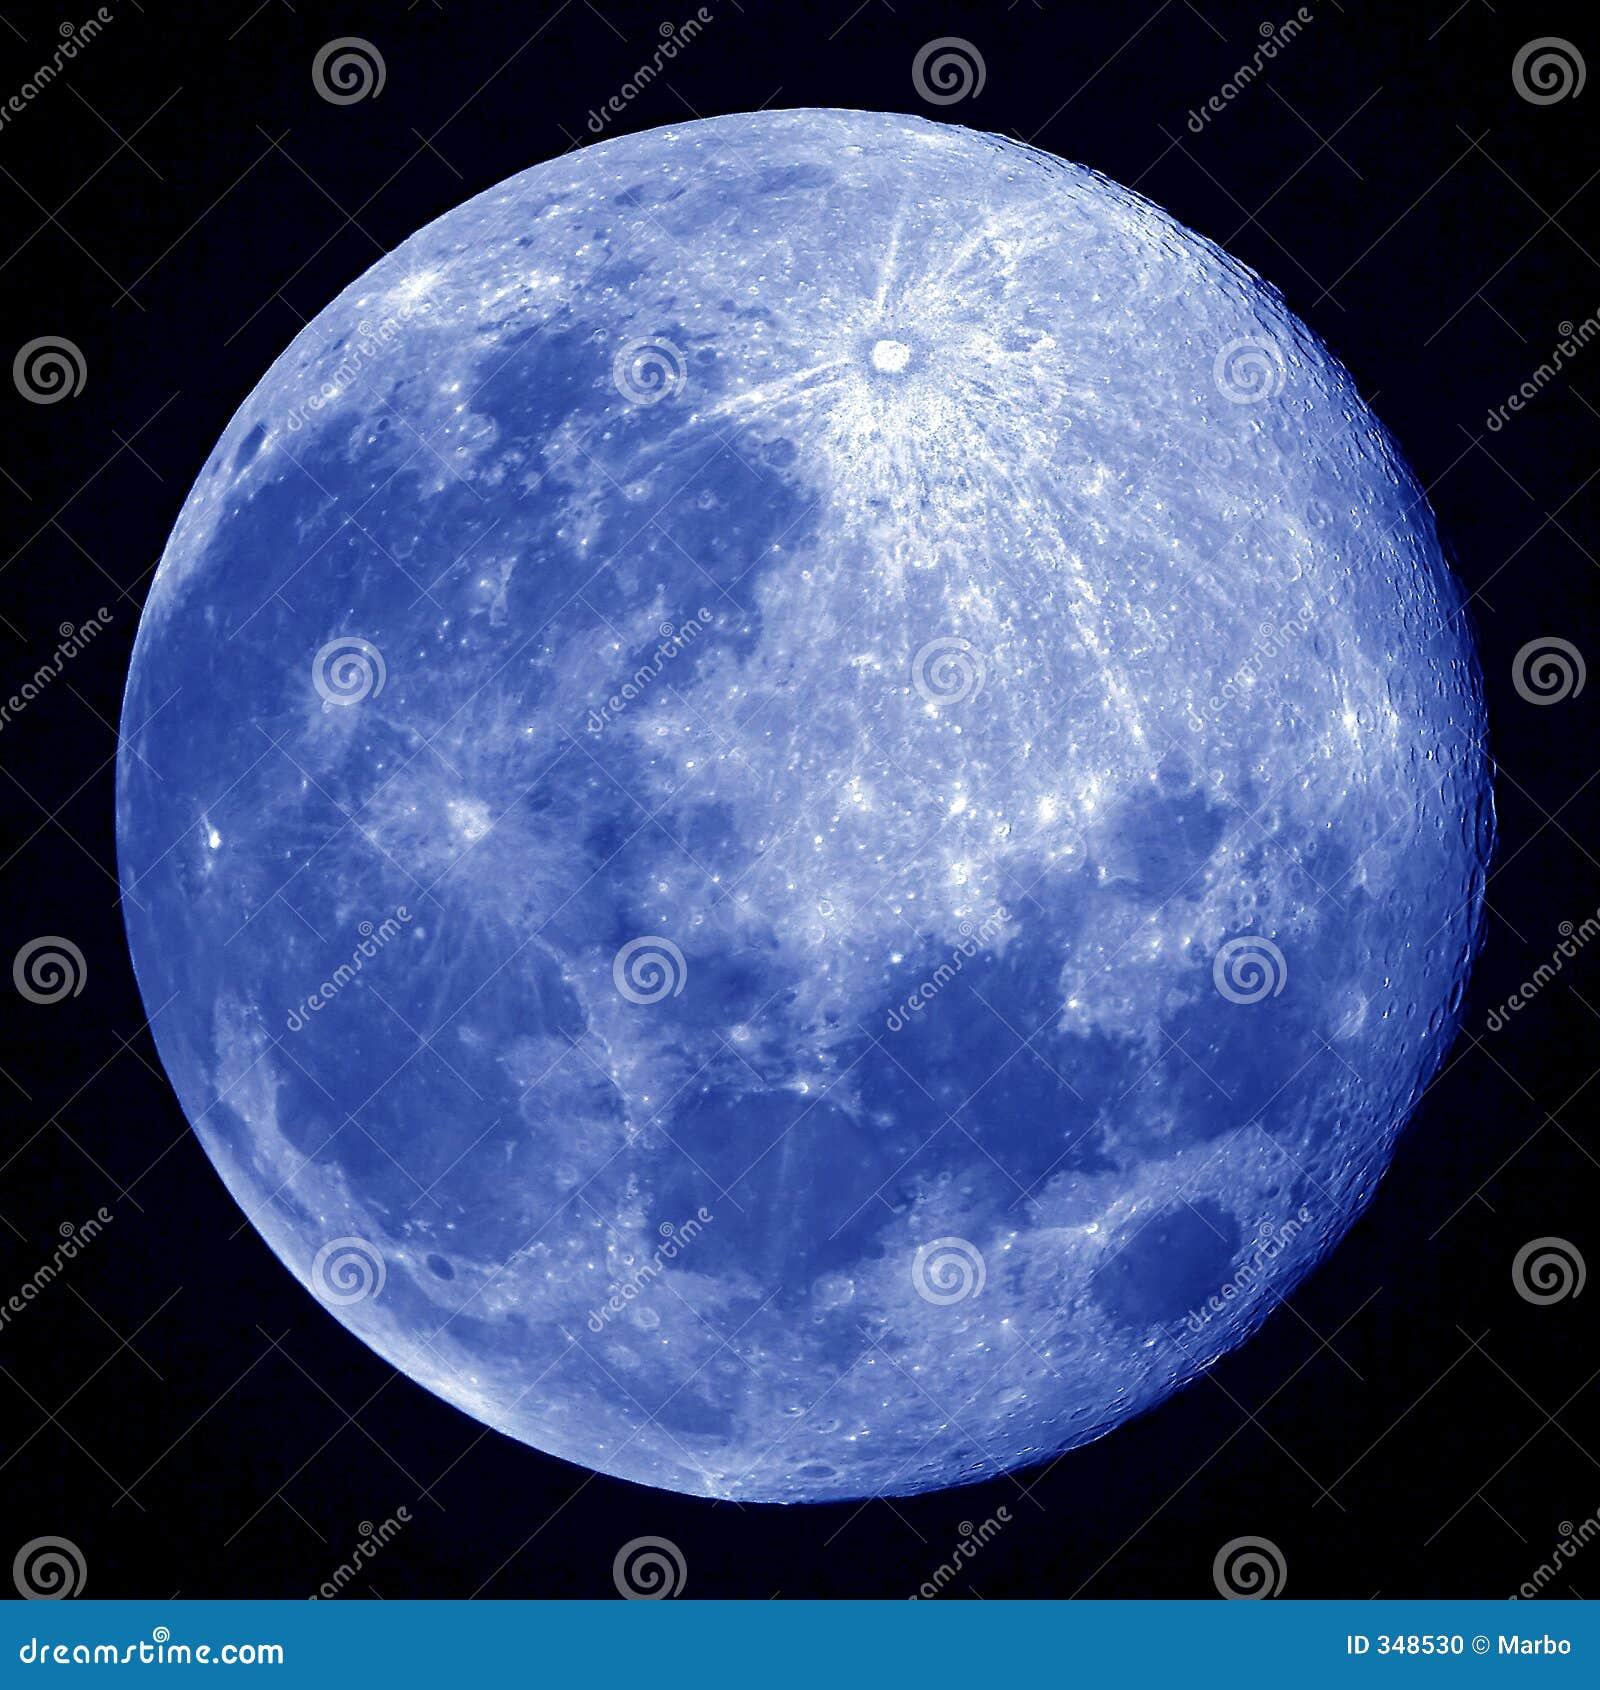 Blue Full Moon Stock Photo - Image: 348530